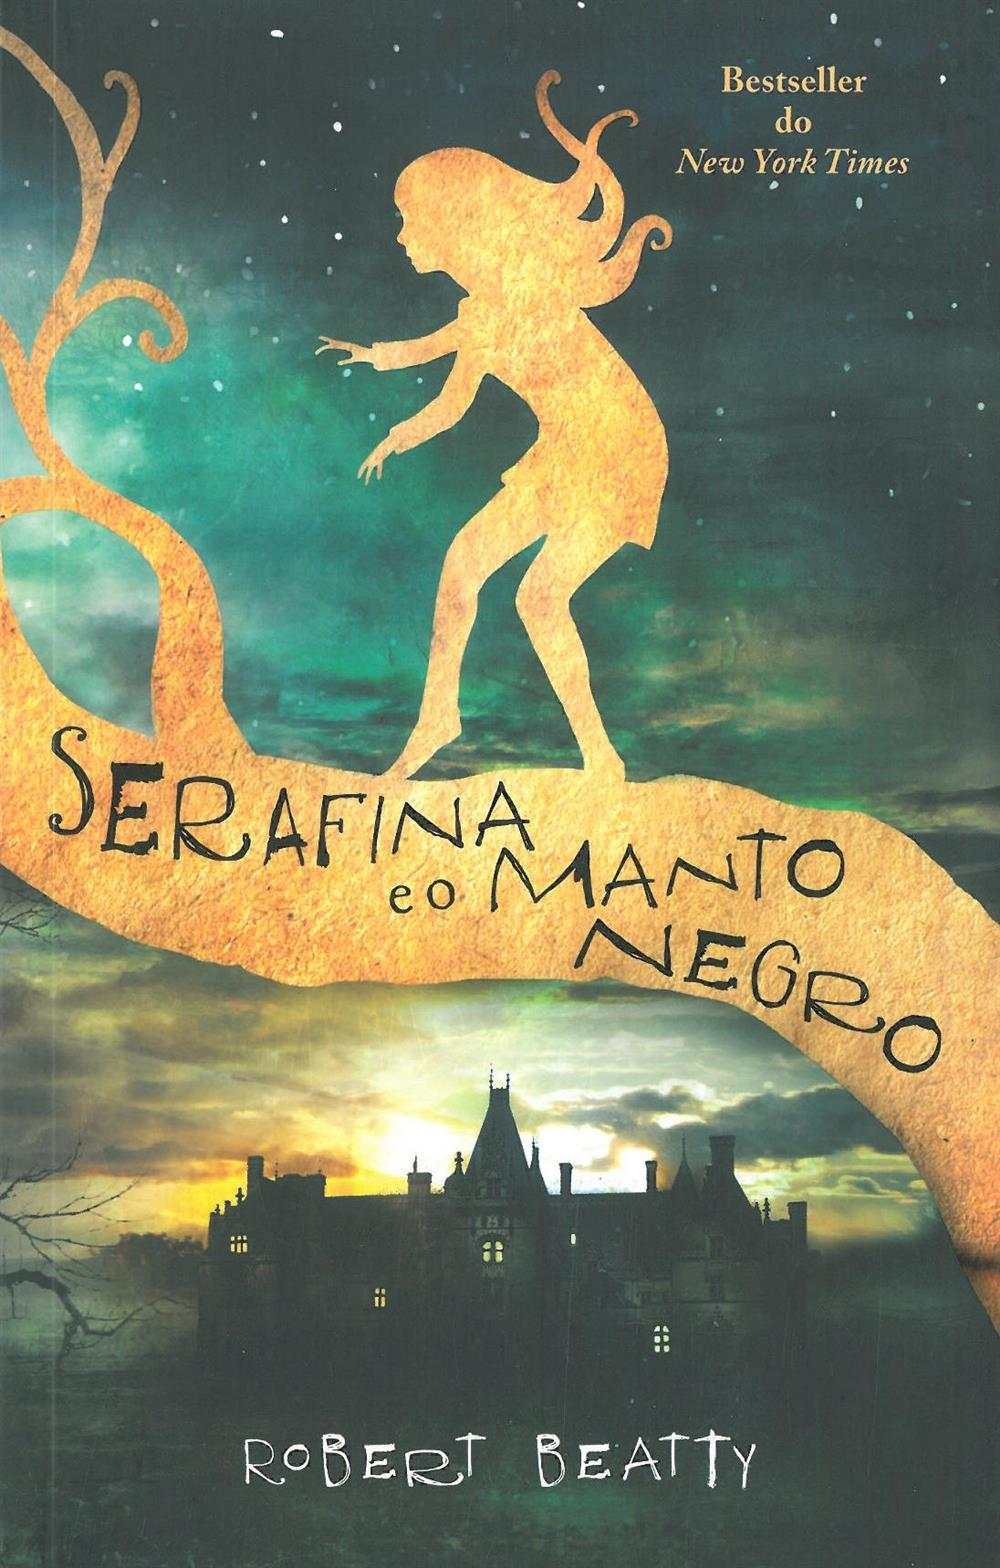 Serafina e o manto negro_.jpg